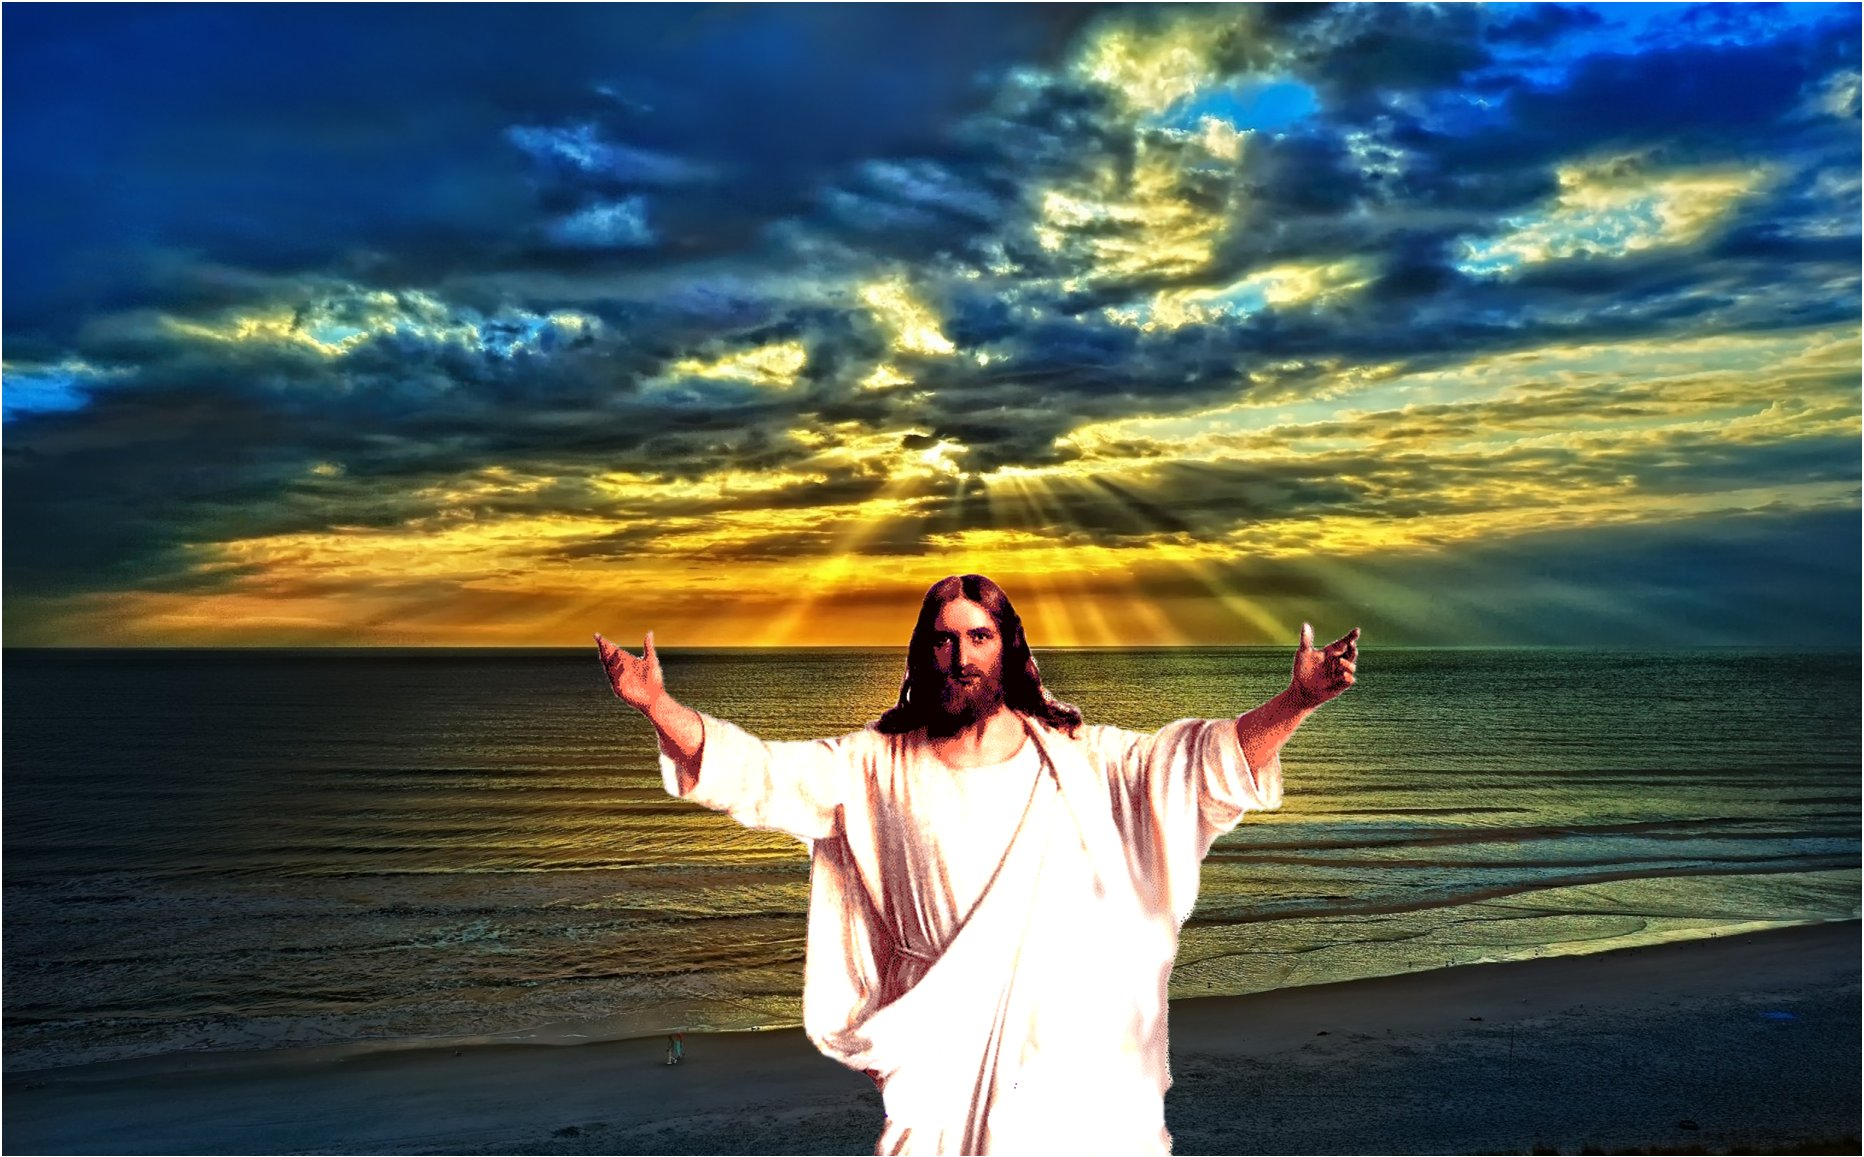 J sus christ fonds d 39 cran hd - Wallpaper de jesus ...